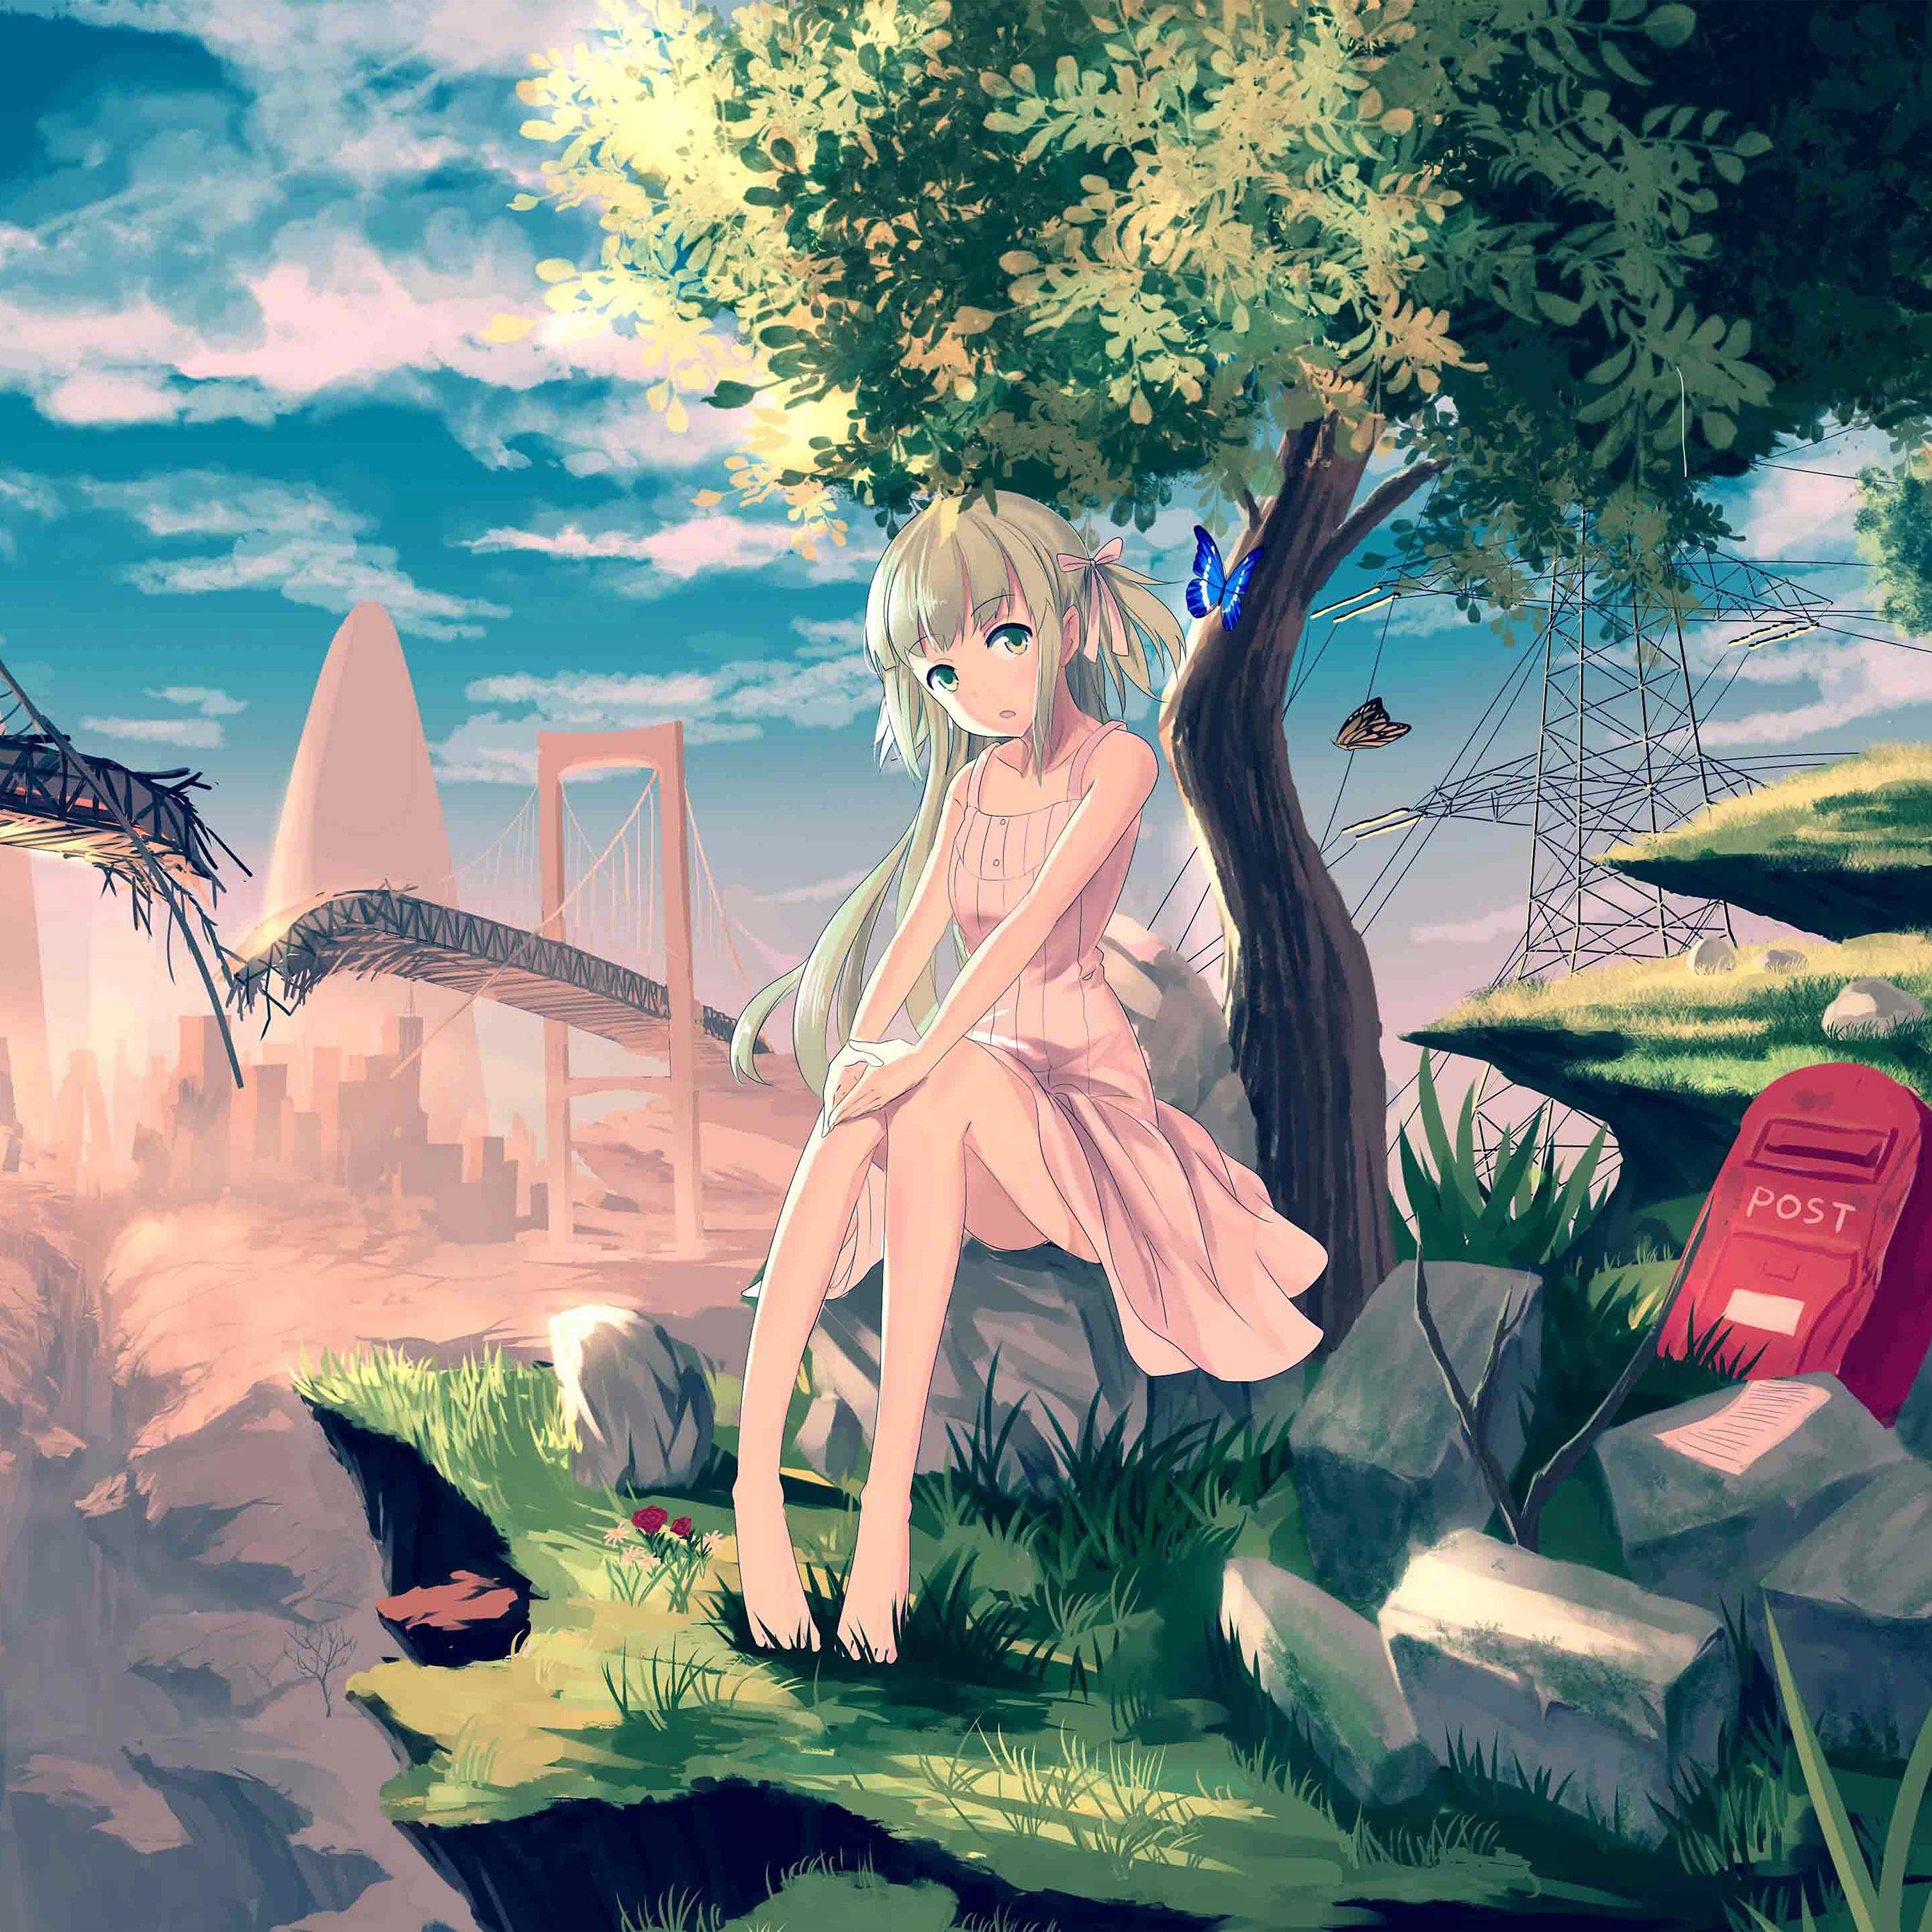 papers.co-au48-cute-anime-girl-sunset-illustration-art-40-wallpaper Best Of Anime Art For Android @koolgadgetz.com.info